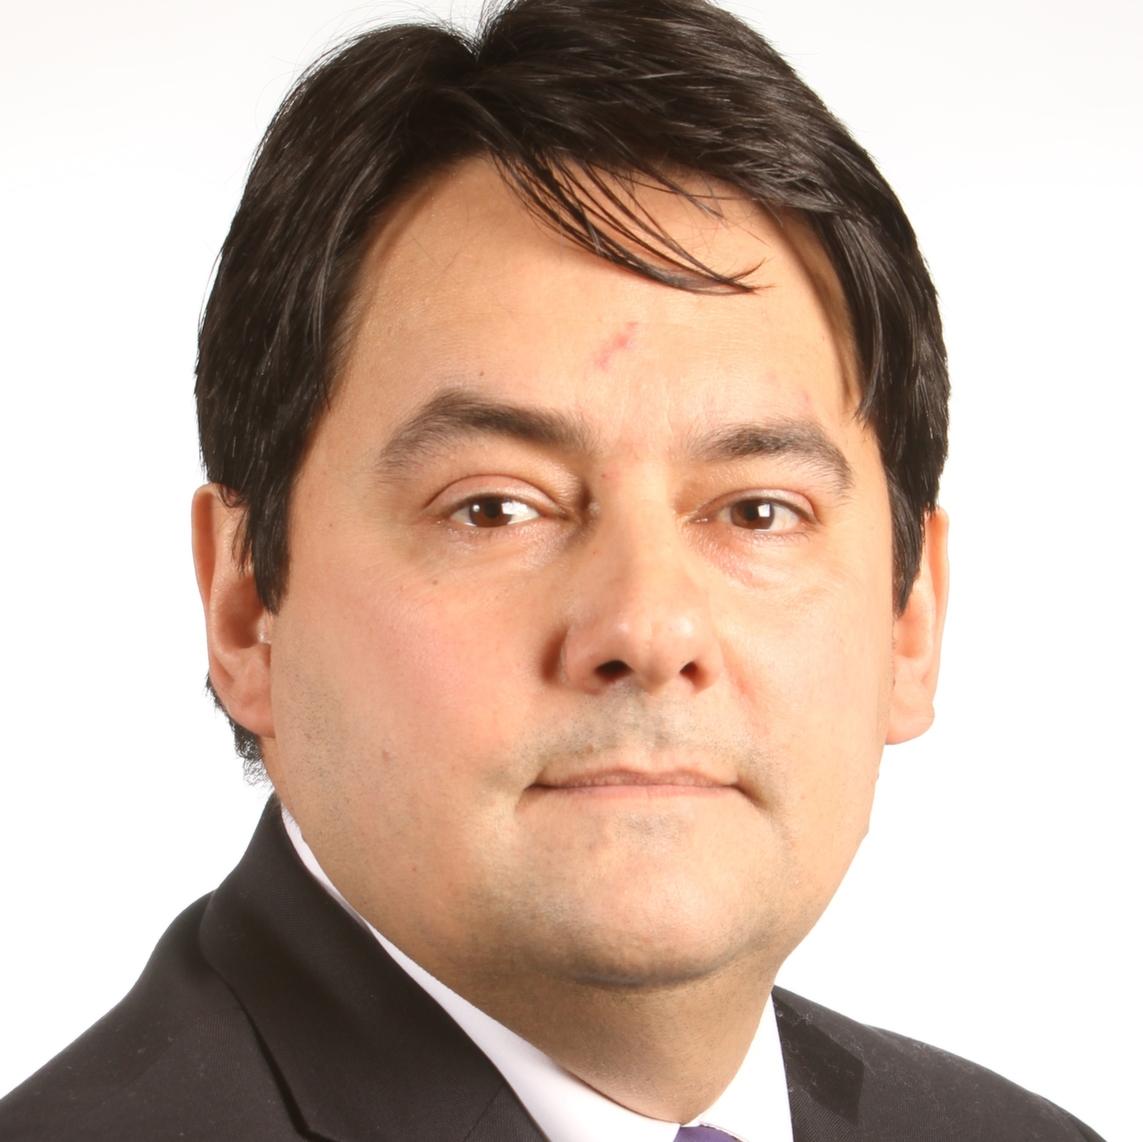 Stephen Twigg MP, Labour/Co-operative